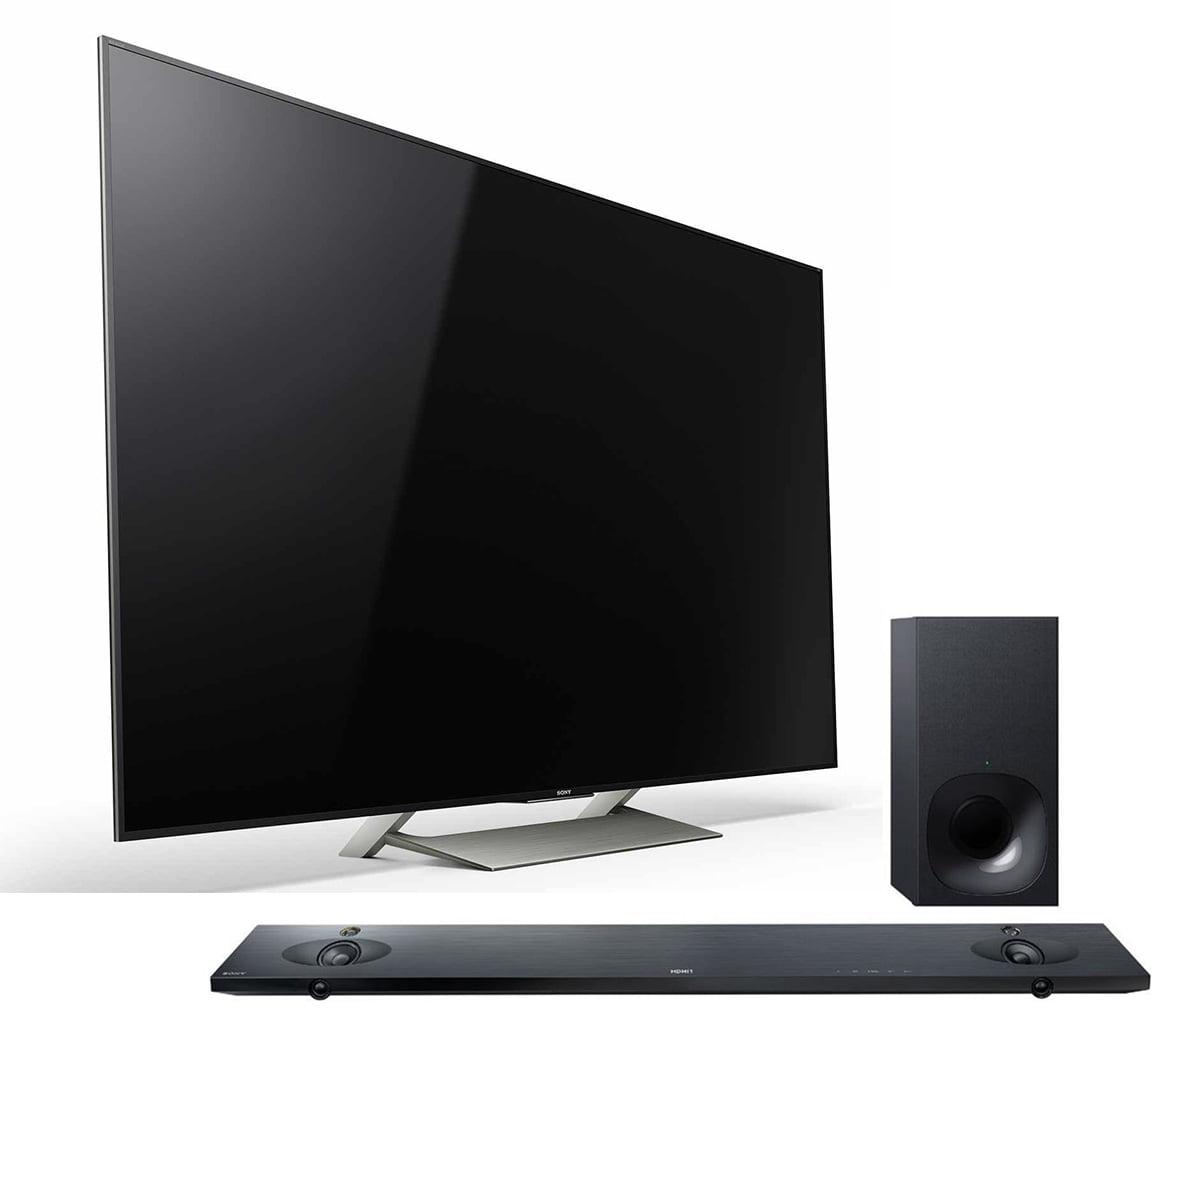 "Sony XBR-65X900E 65"" 4K Ultra HD LED Smart TV with Wi-Fi ..."